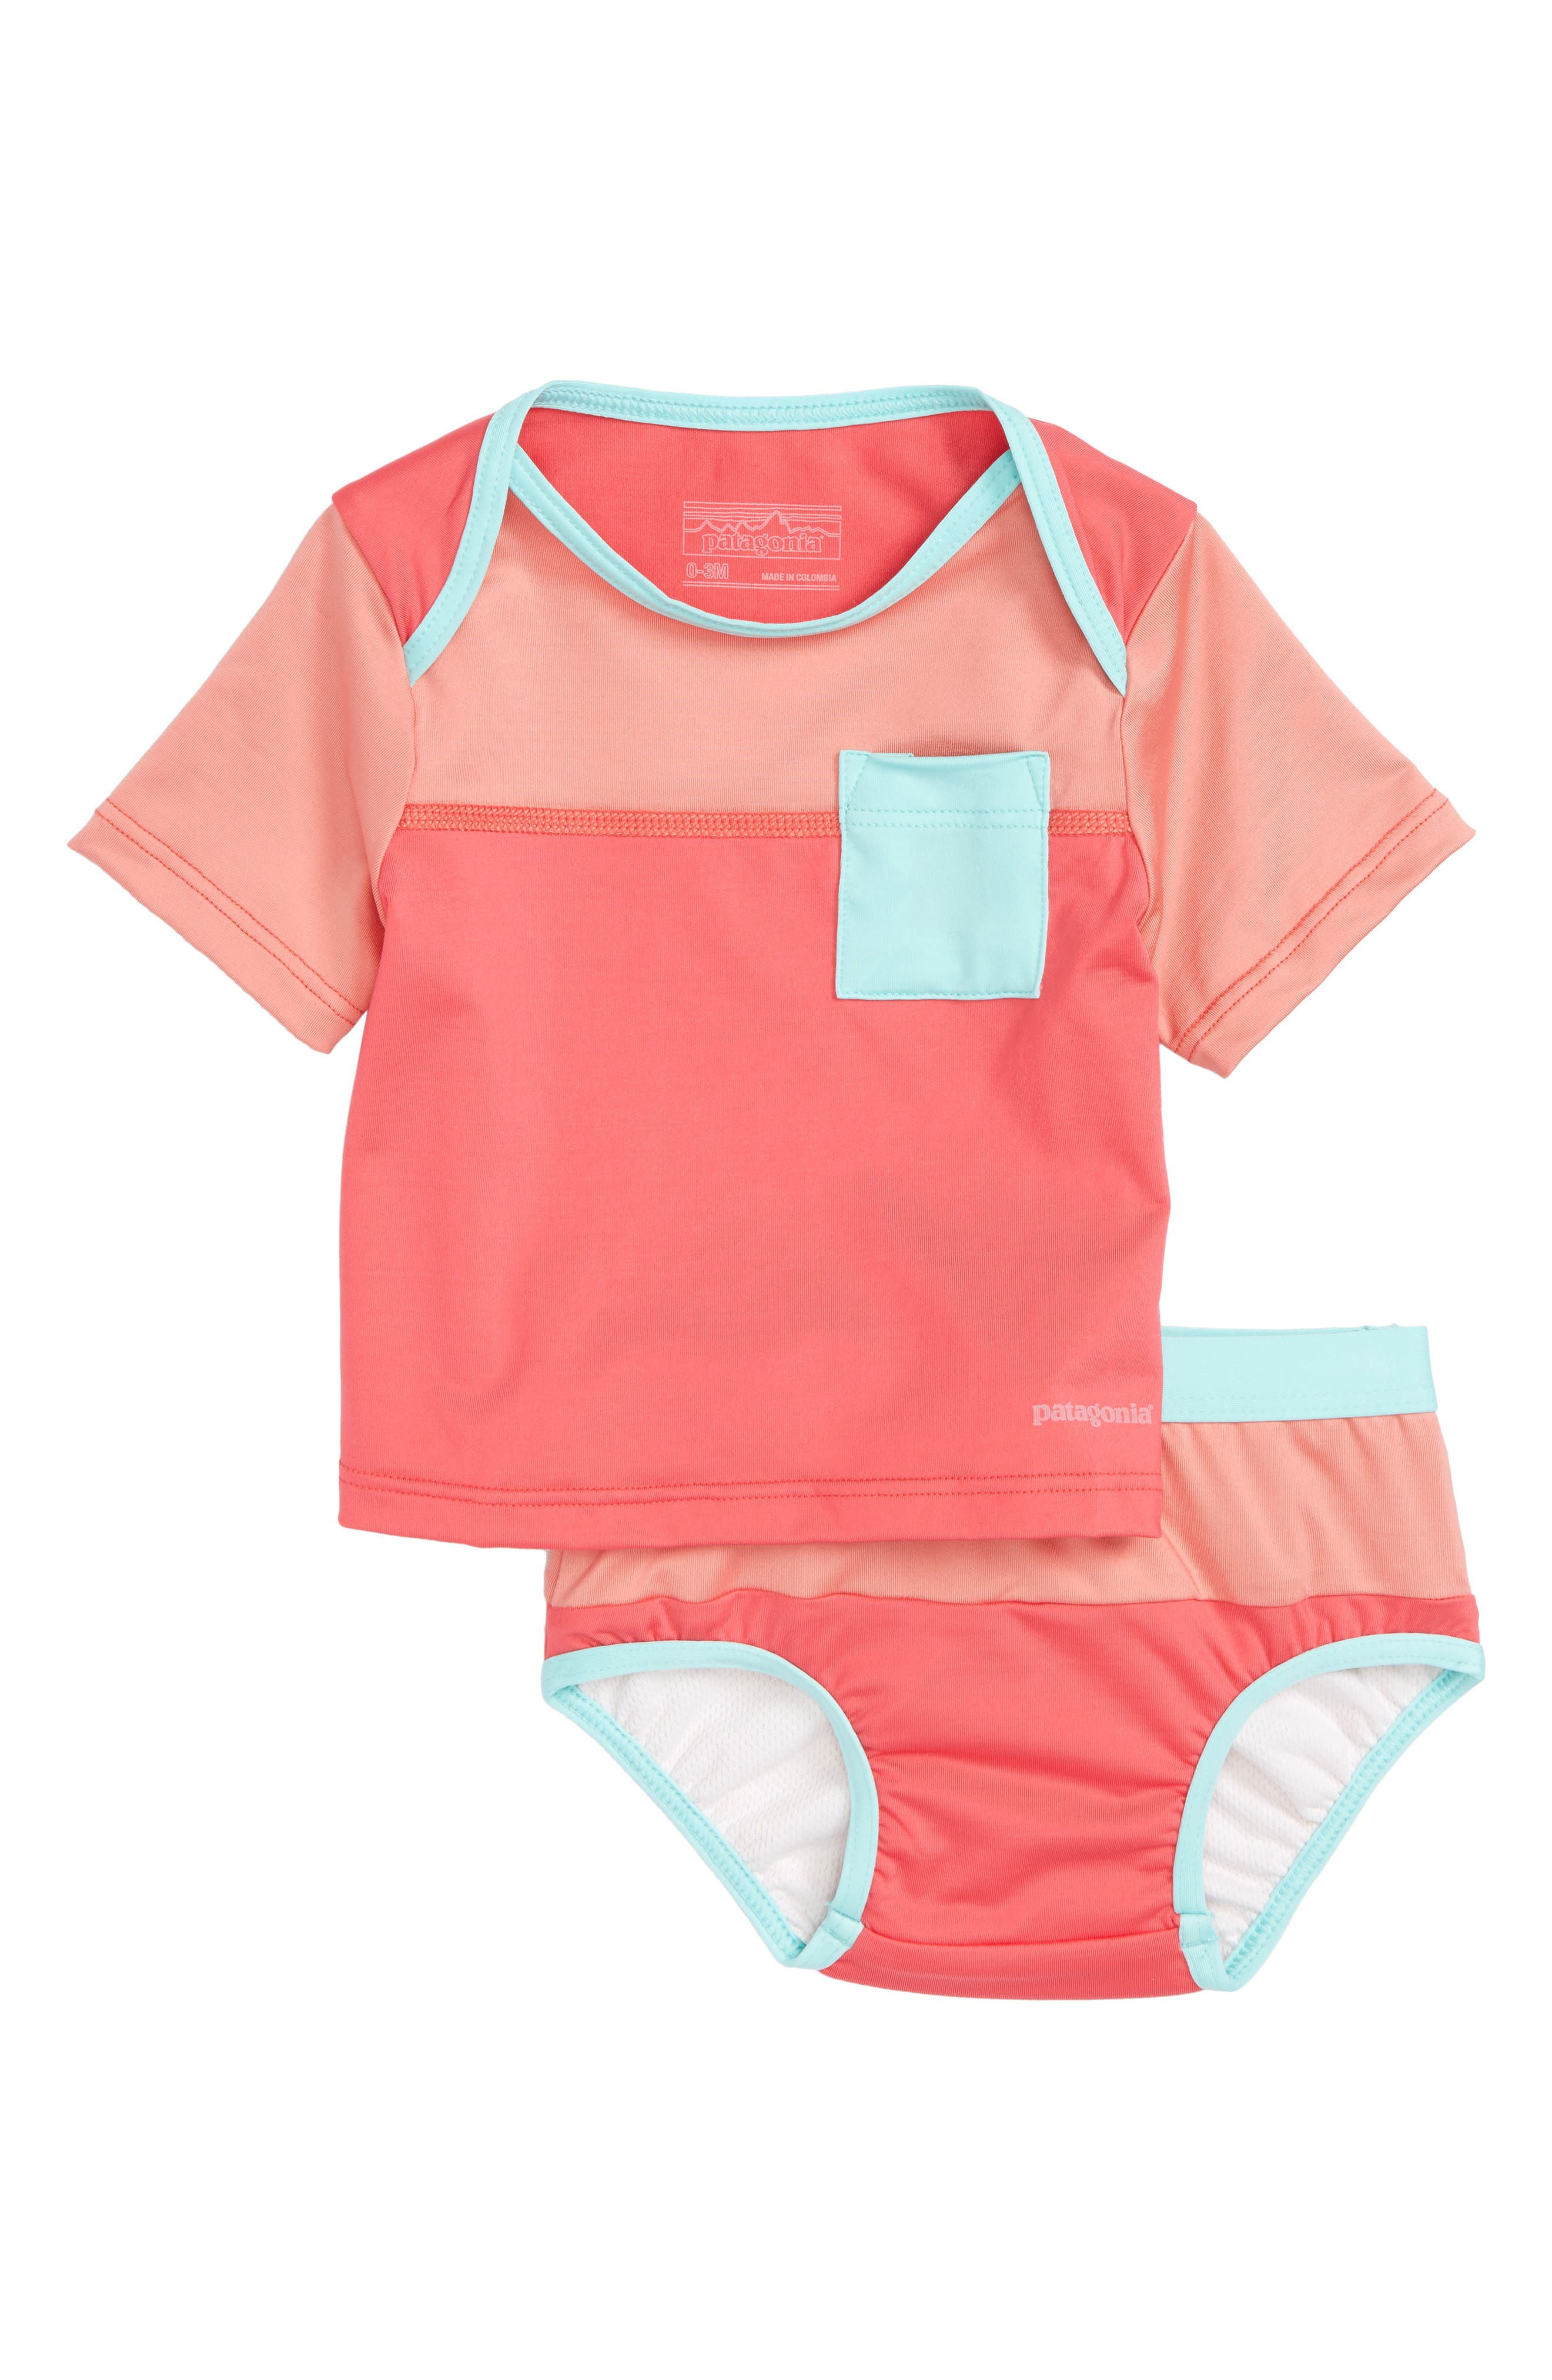 'Little Sol' Two-Piece Rashguard Swimsuit,                             Main thumbnail 1, color,                             Srap Sierra Pink